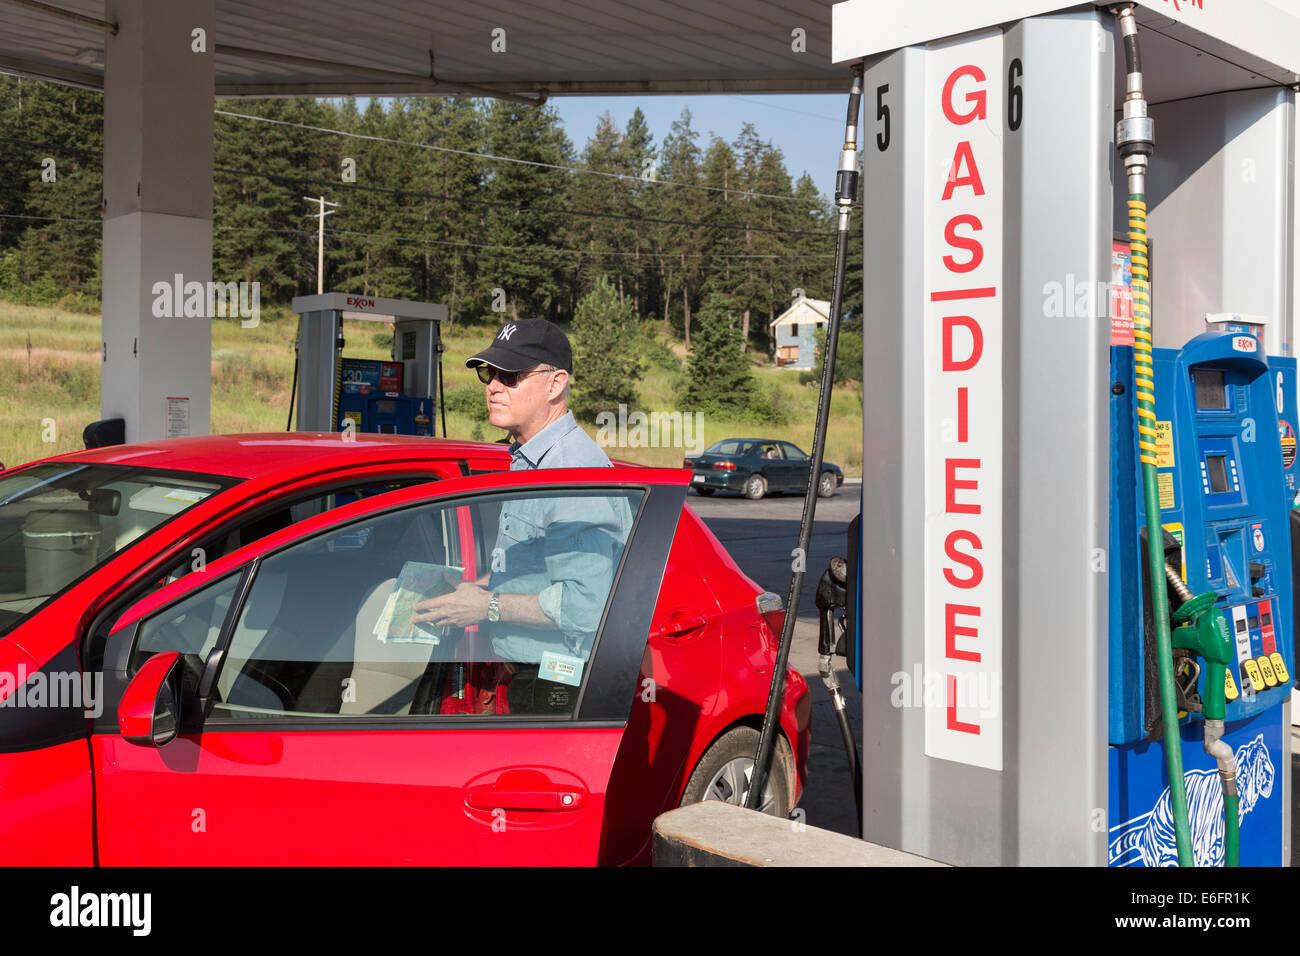 Driver Checking Map at Gas Station, Montana, USA Stock Photo ...